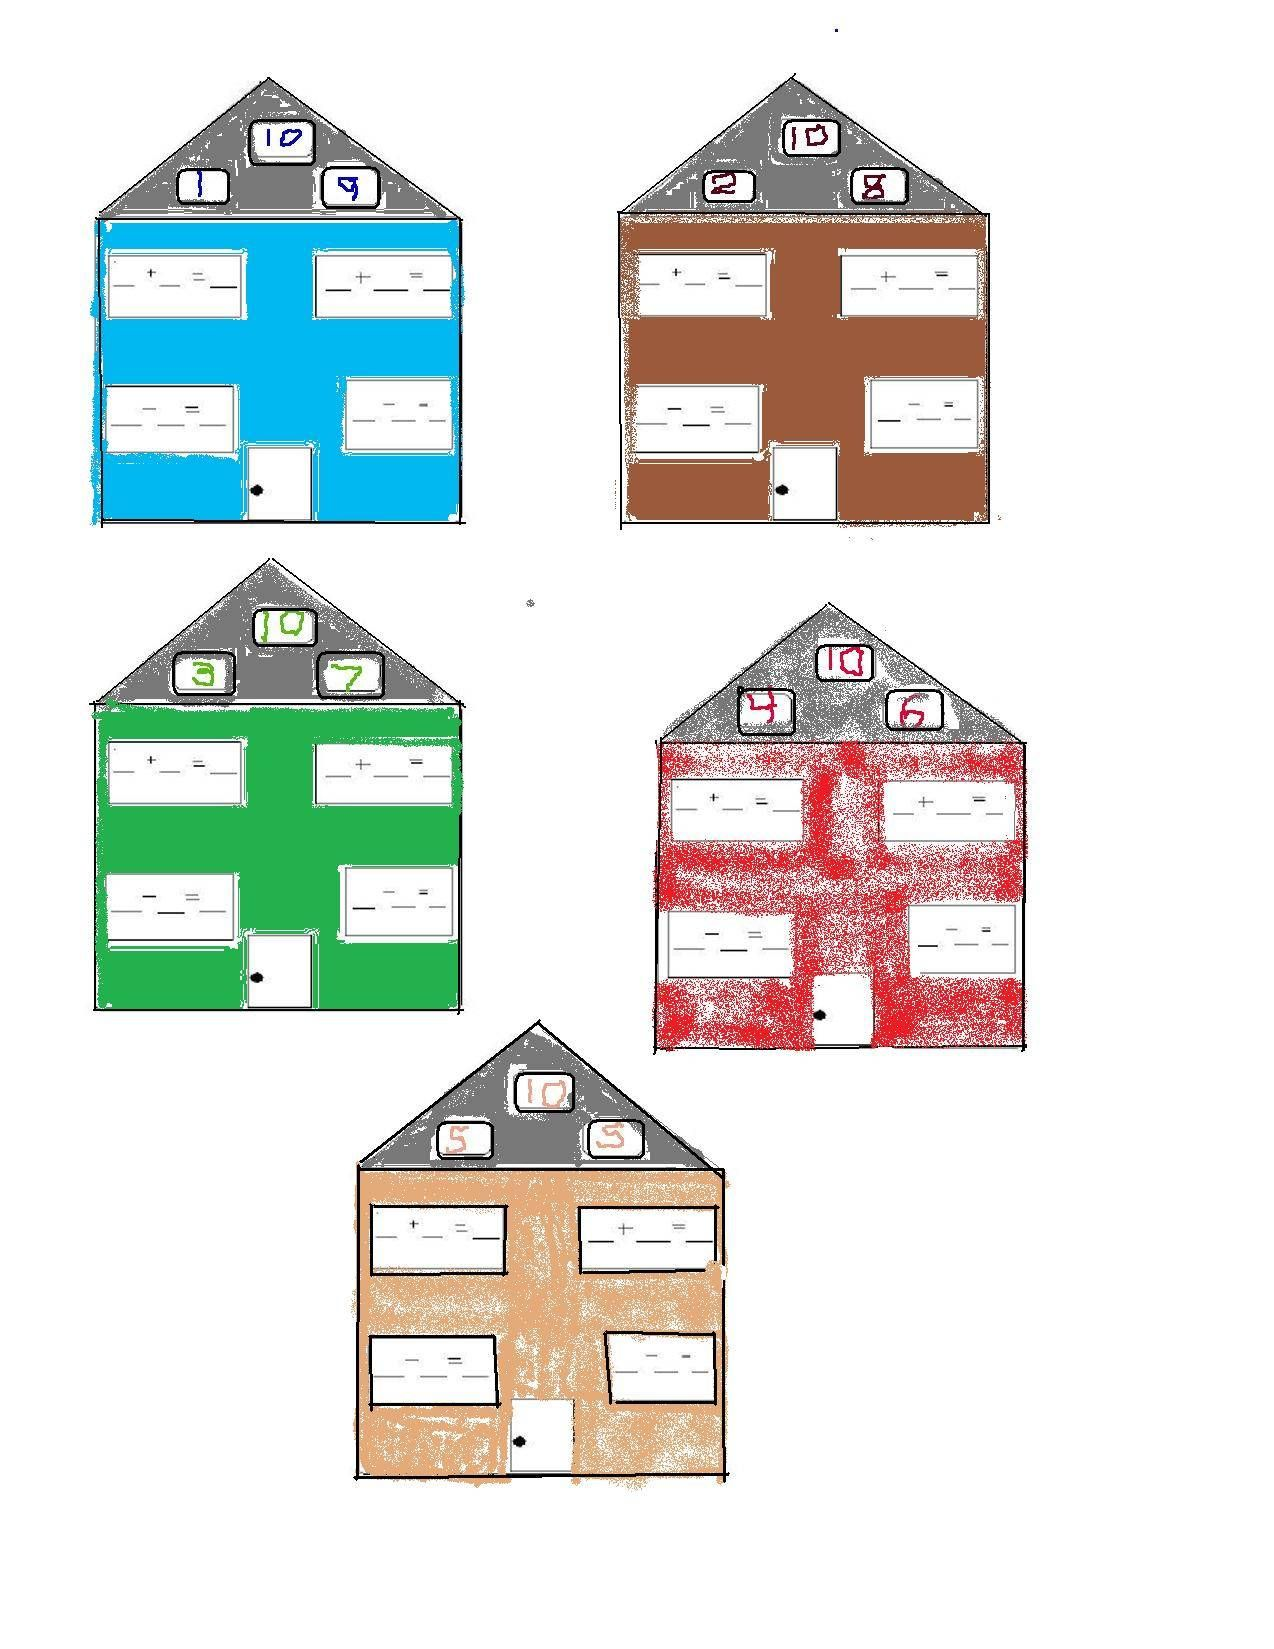 medium resolution of Our Neighbourhood Worksheet   Printable Worksheets and Activities for  Teachers